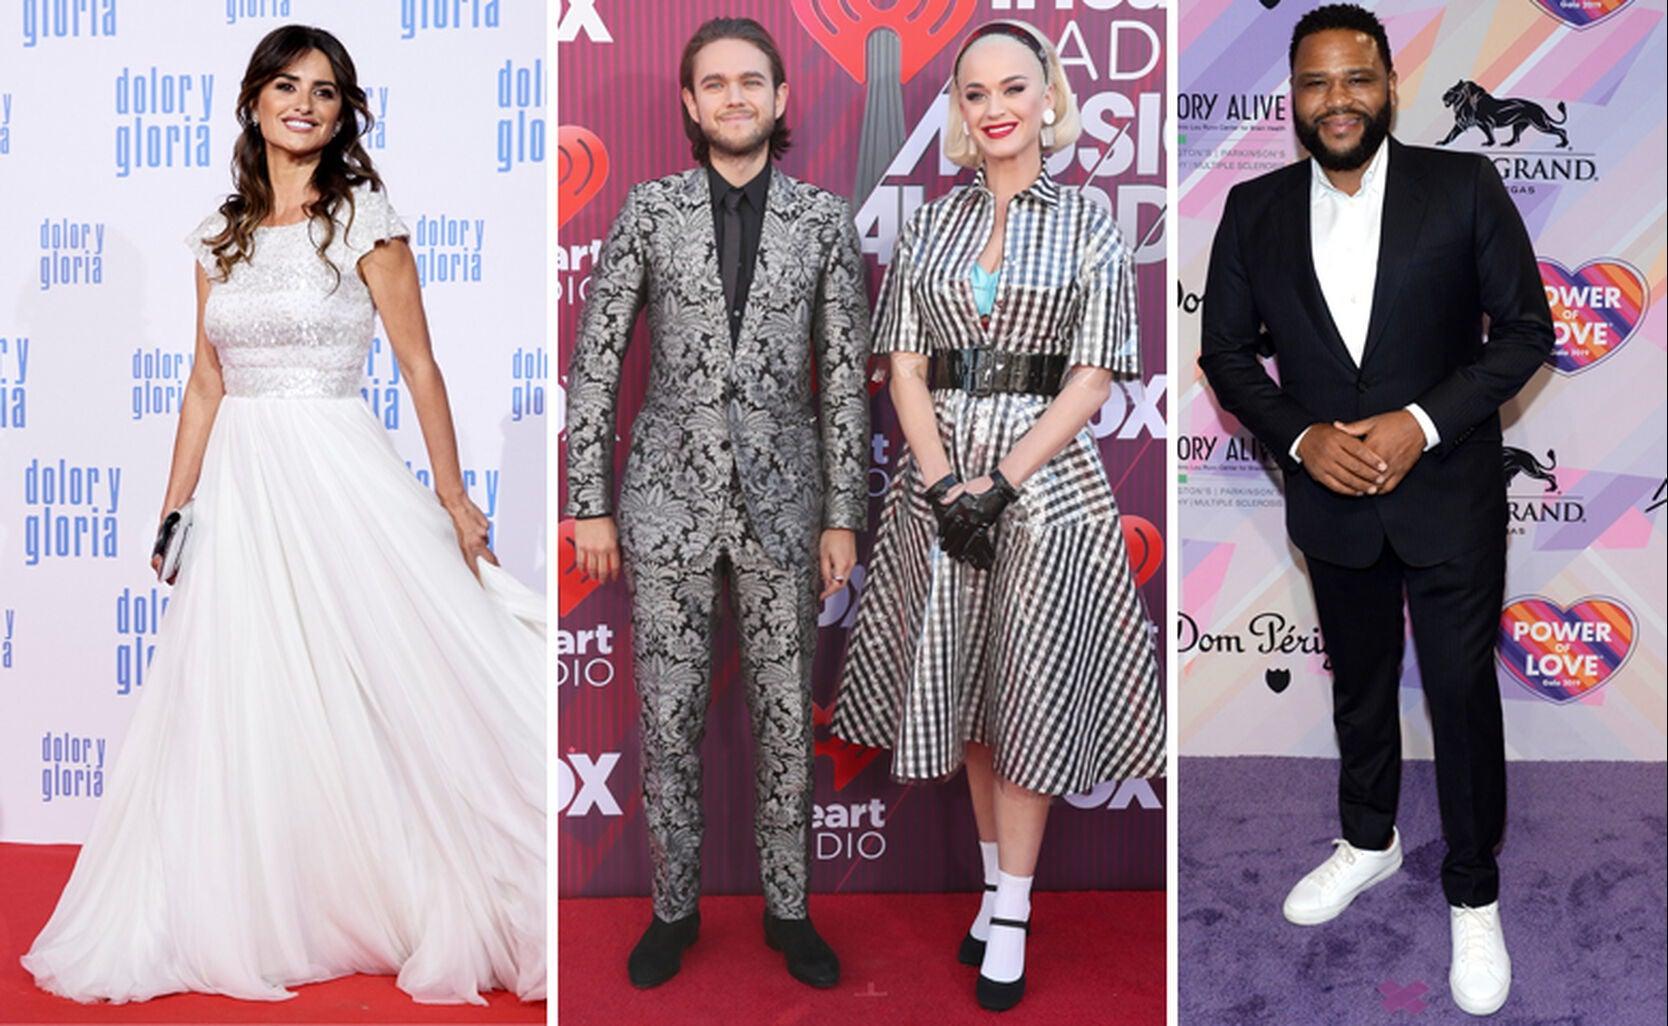 Penelope Cruz, Zedd with Katy Perry, Anthony Anderson